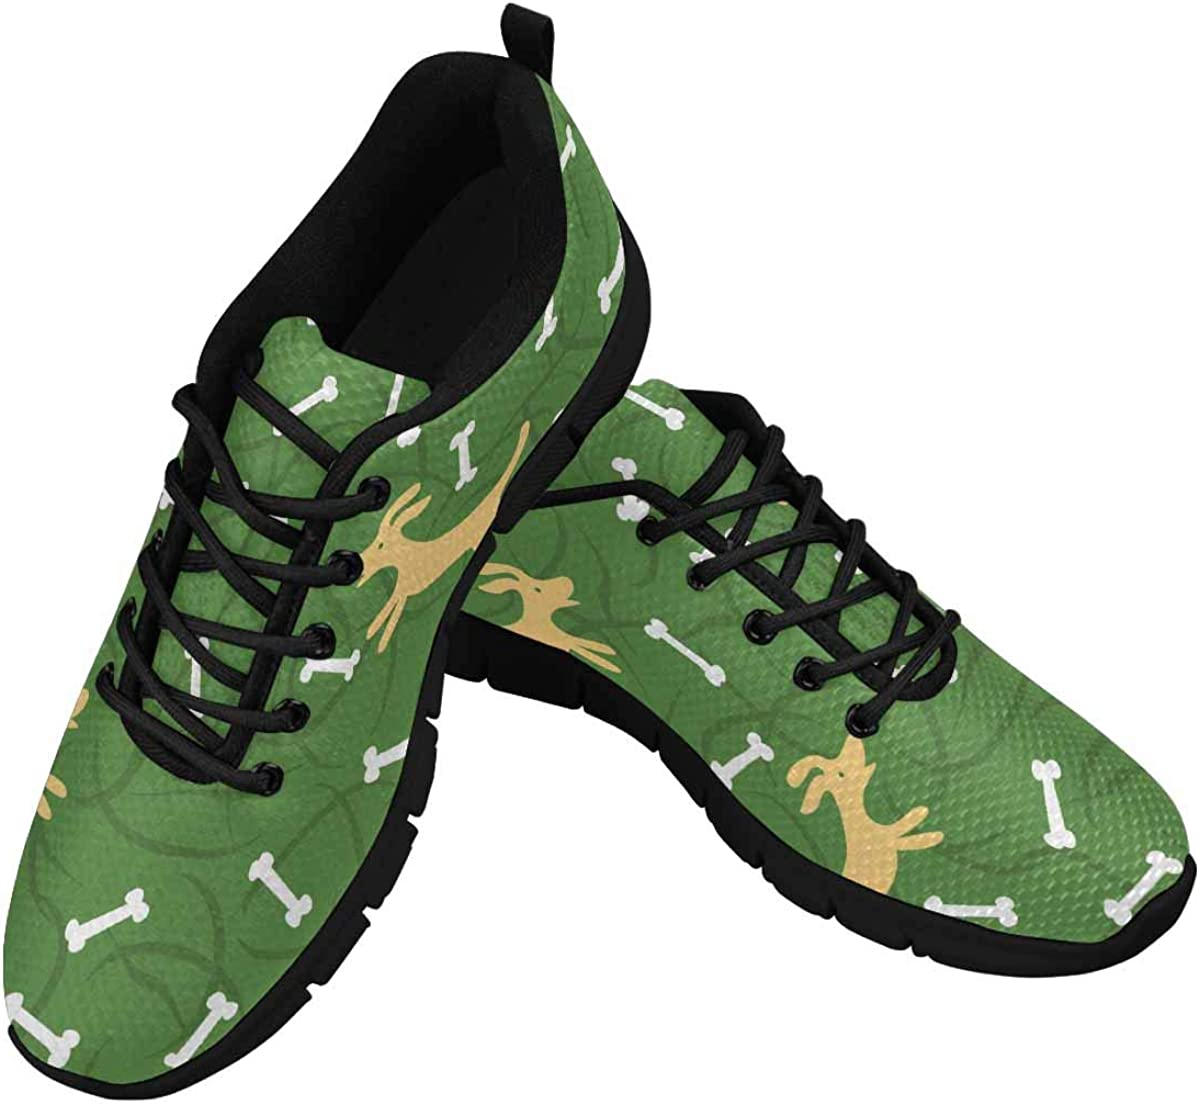 INTERESTPRINT Dogs with Bones Women's Walking Shoes Lightweight Casual Running Sneakers